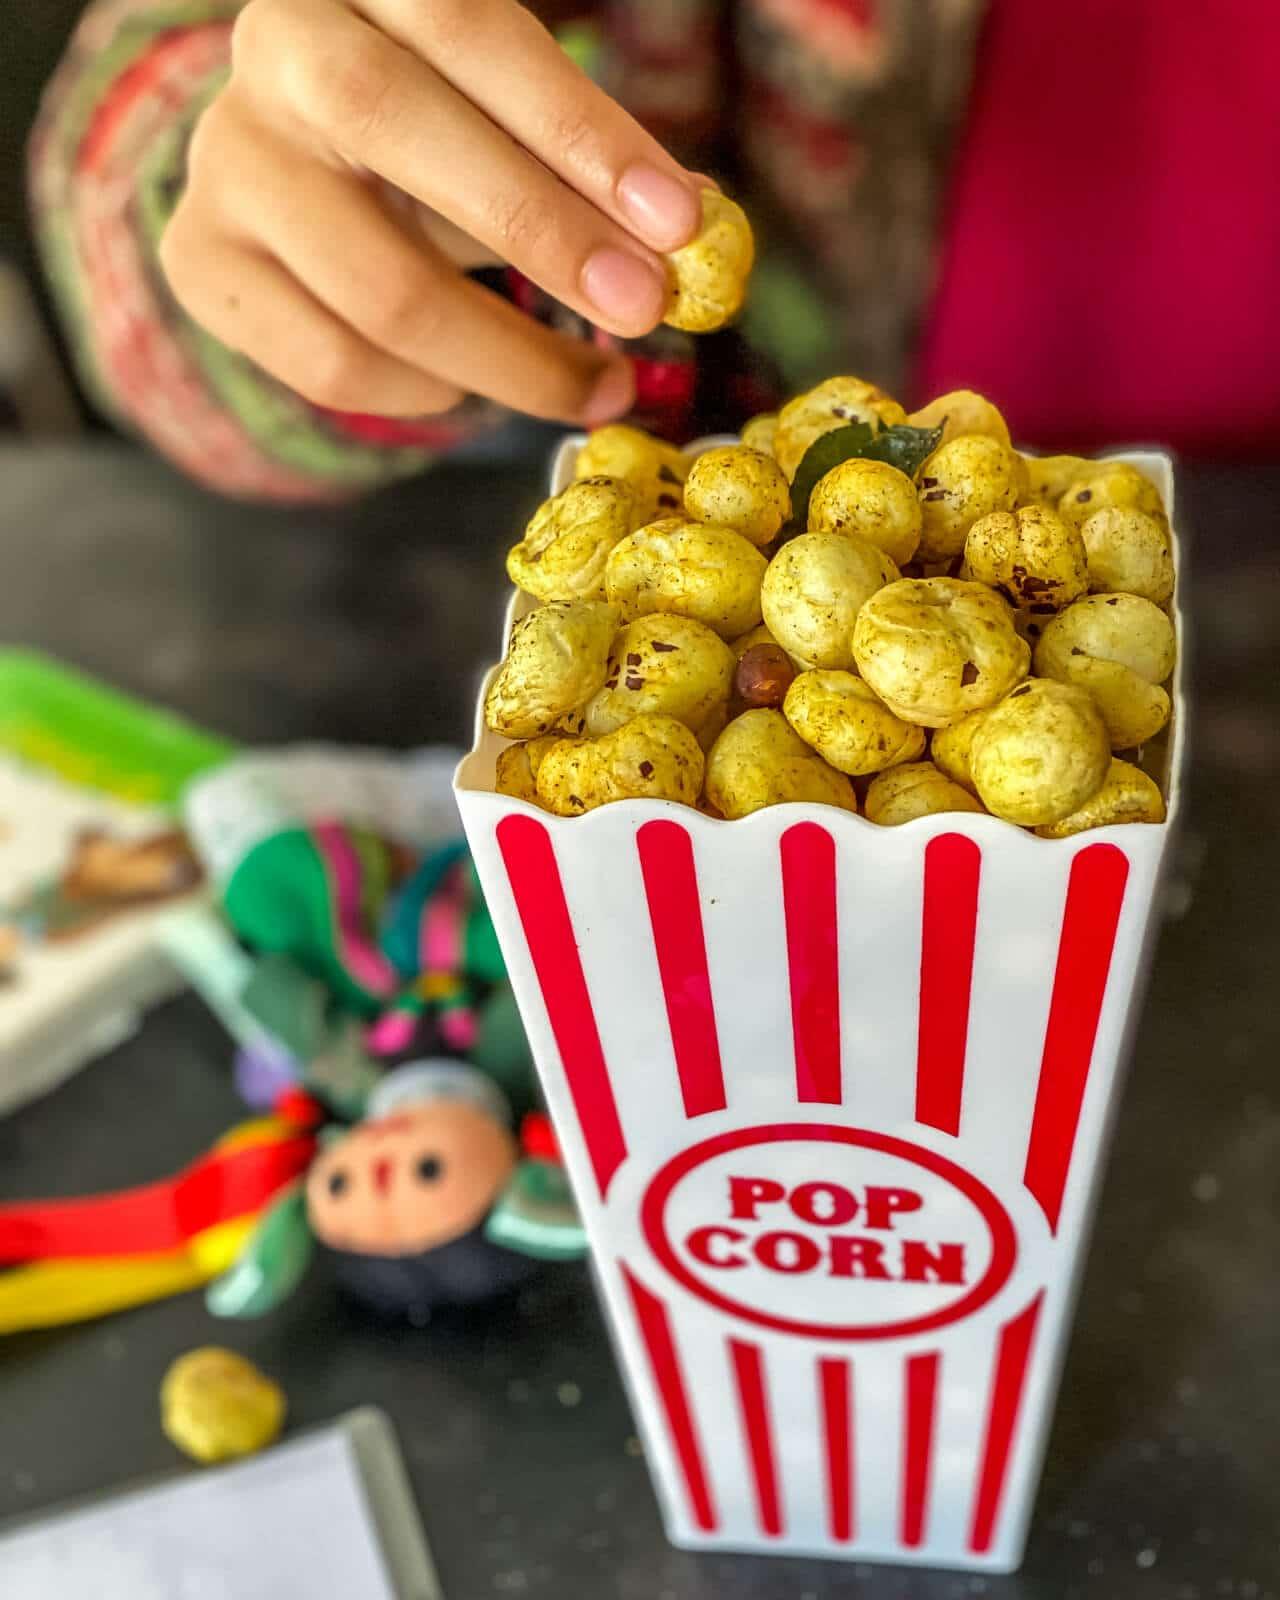 A hand picking a makhana kept in a popcorn box